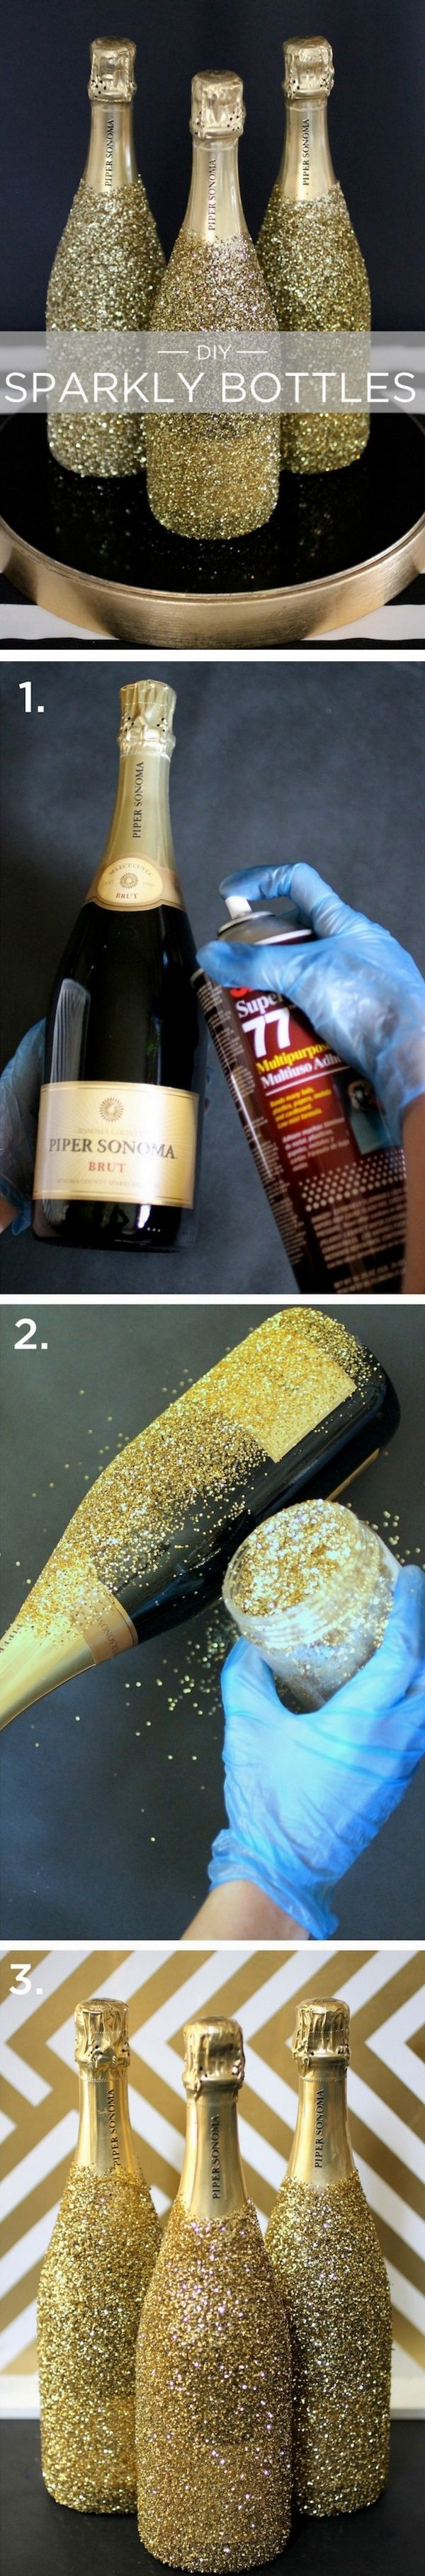 best quinceñera ideas images on pinterest wedding hair styles